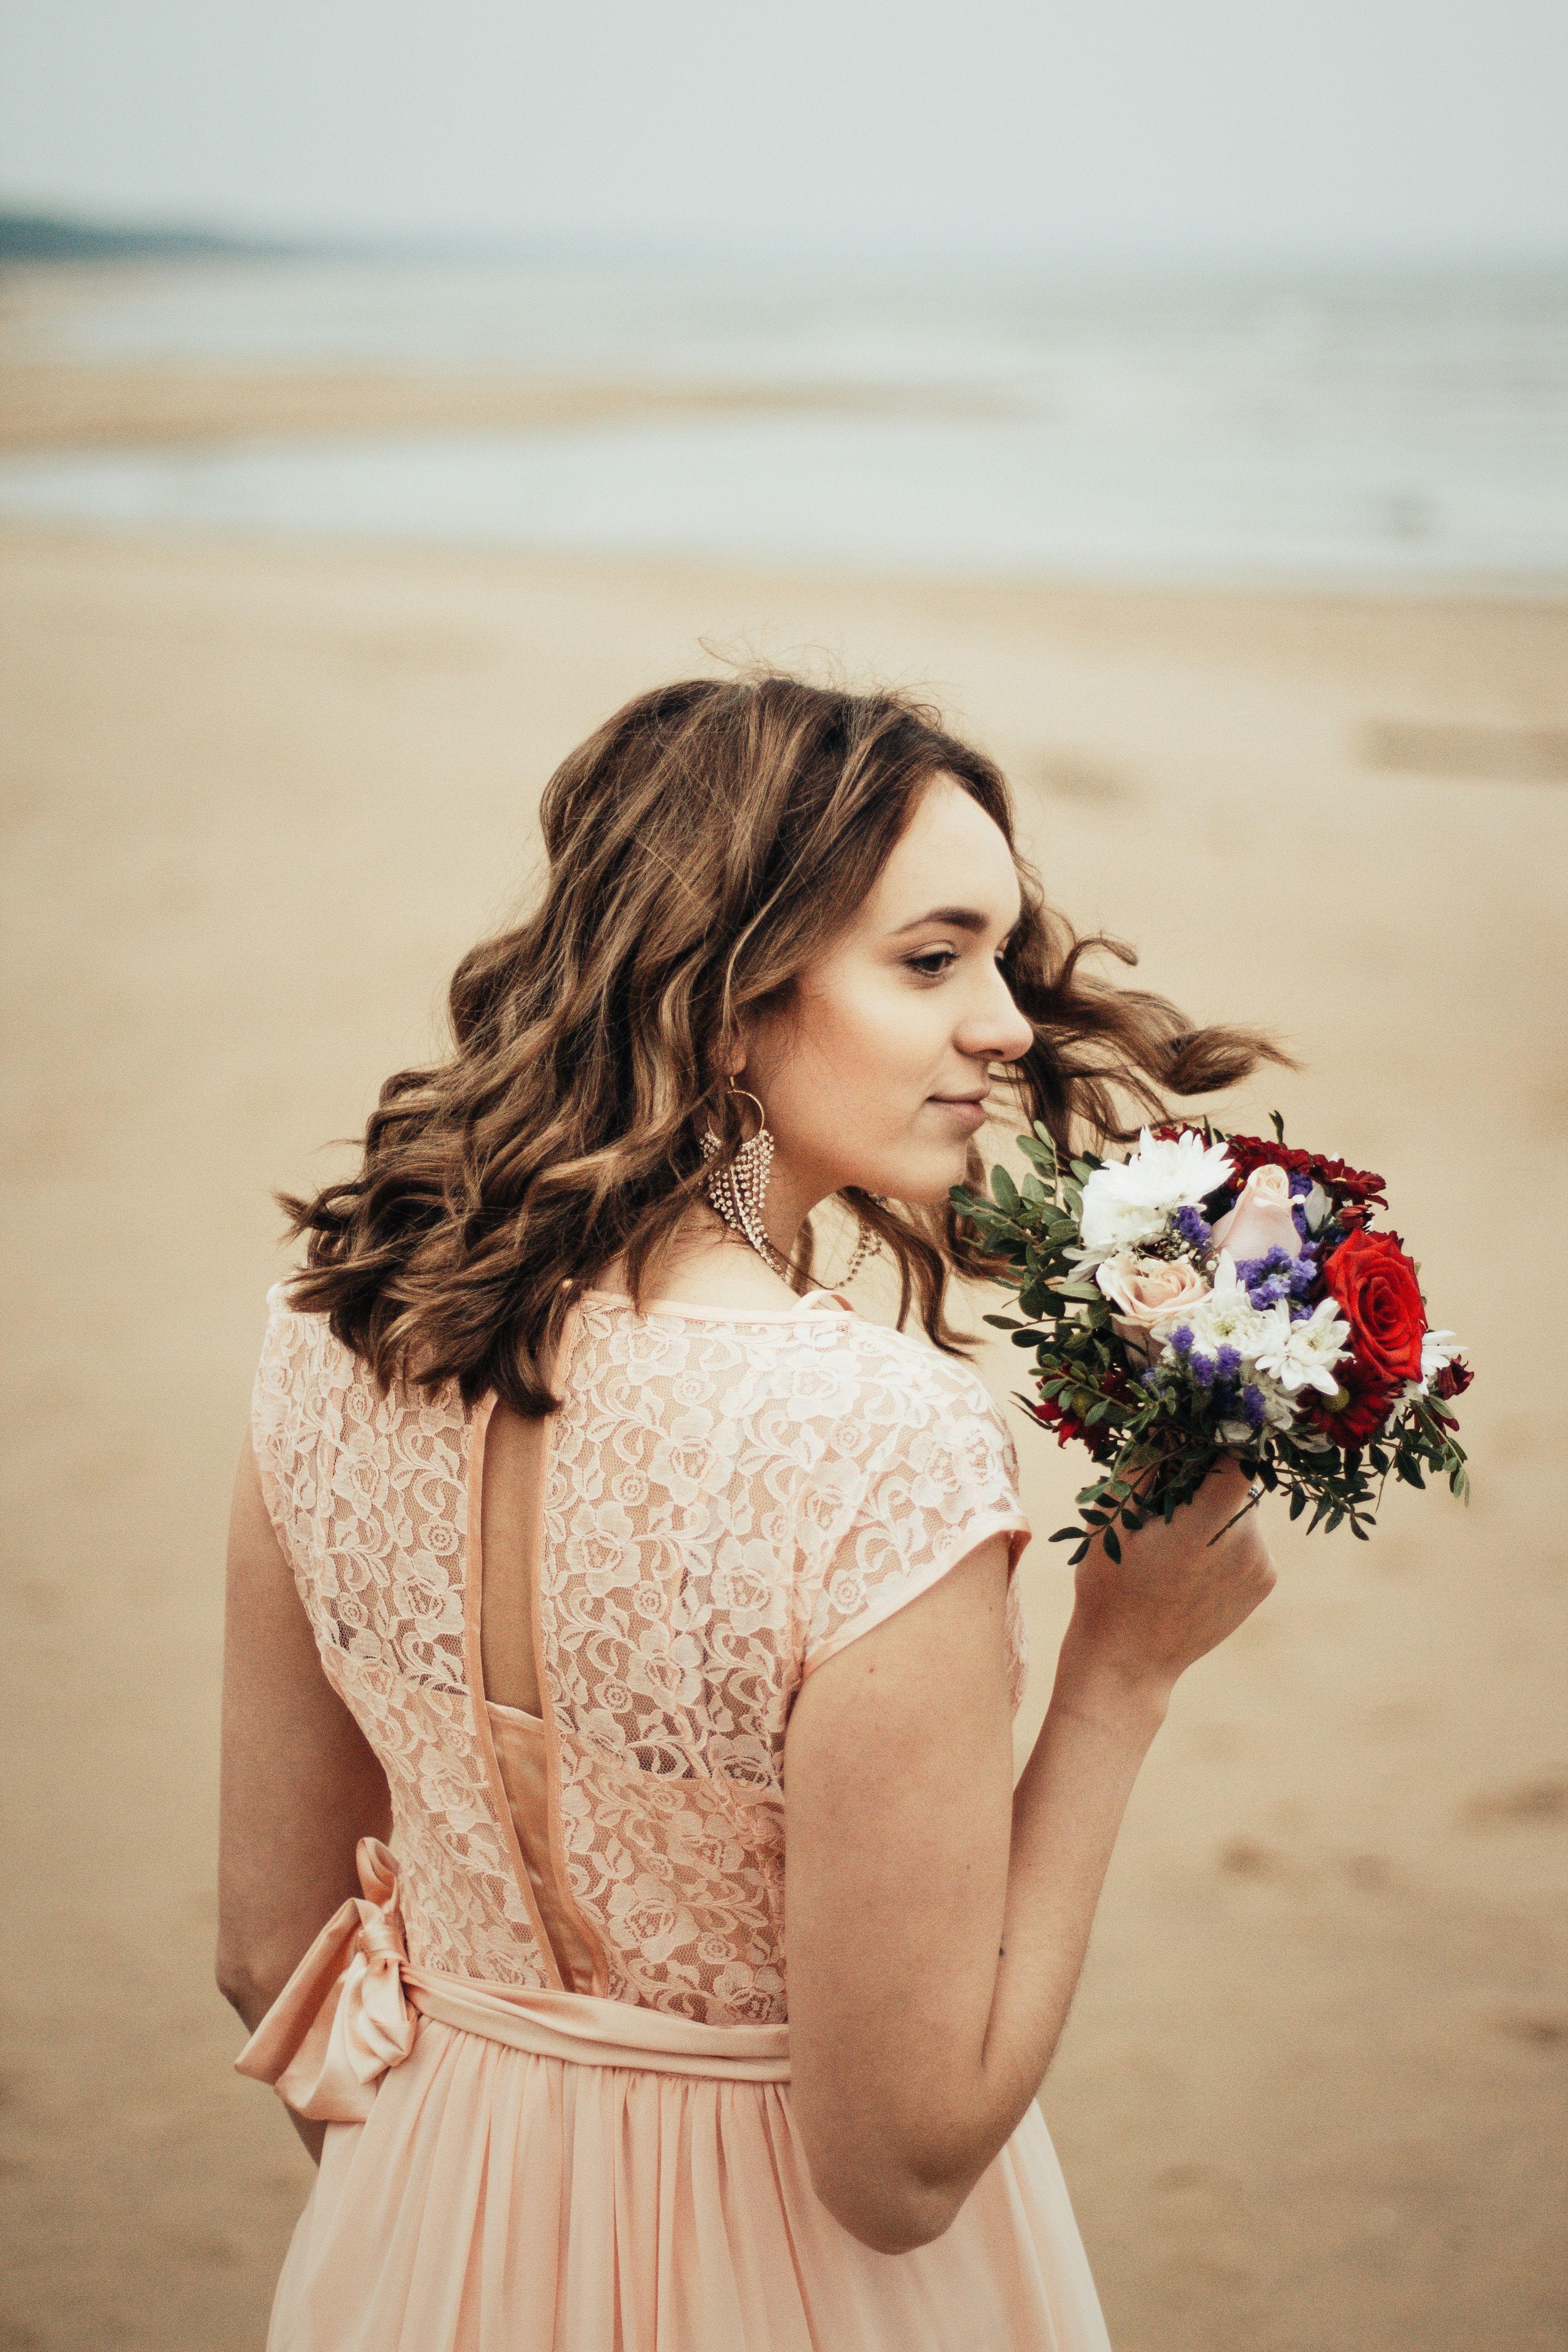 Canon Canon Eos 7d 141210 Wedding Planner Wedding Planning Wedding Marketing